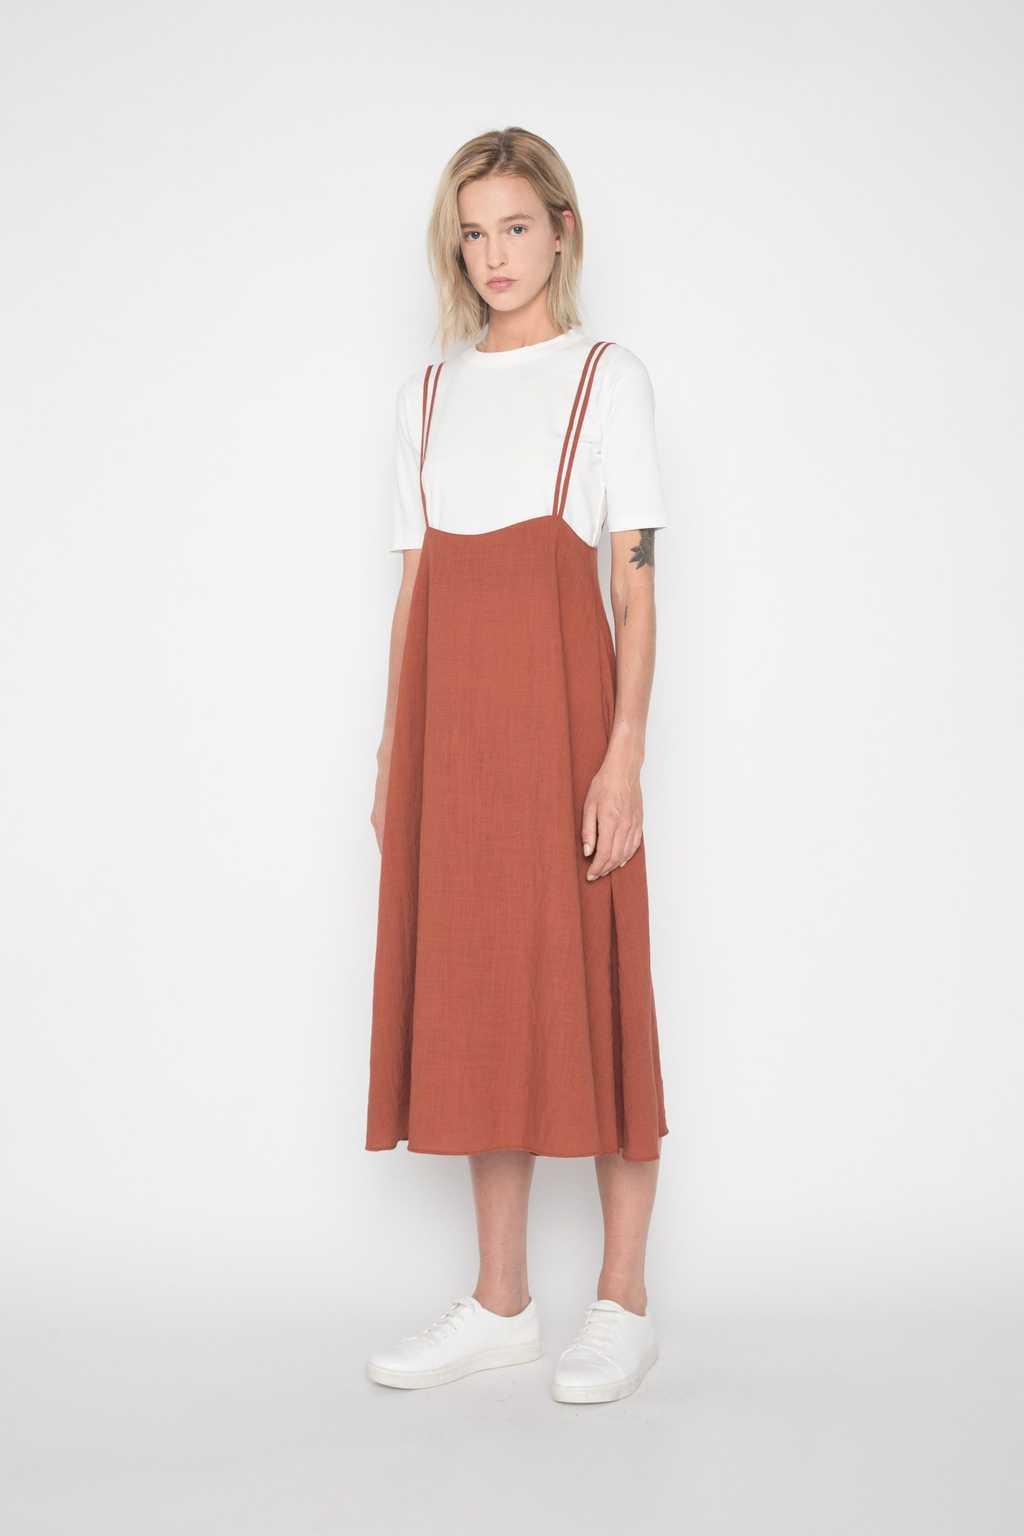 Dress H185 Brown 3